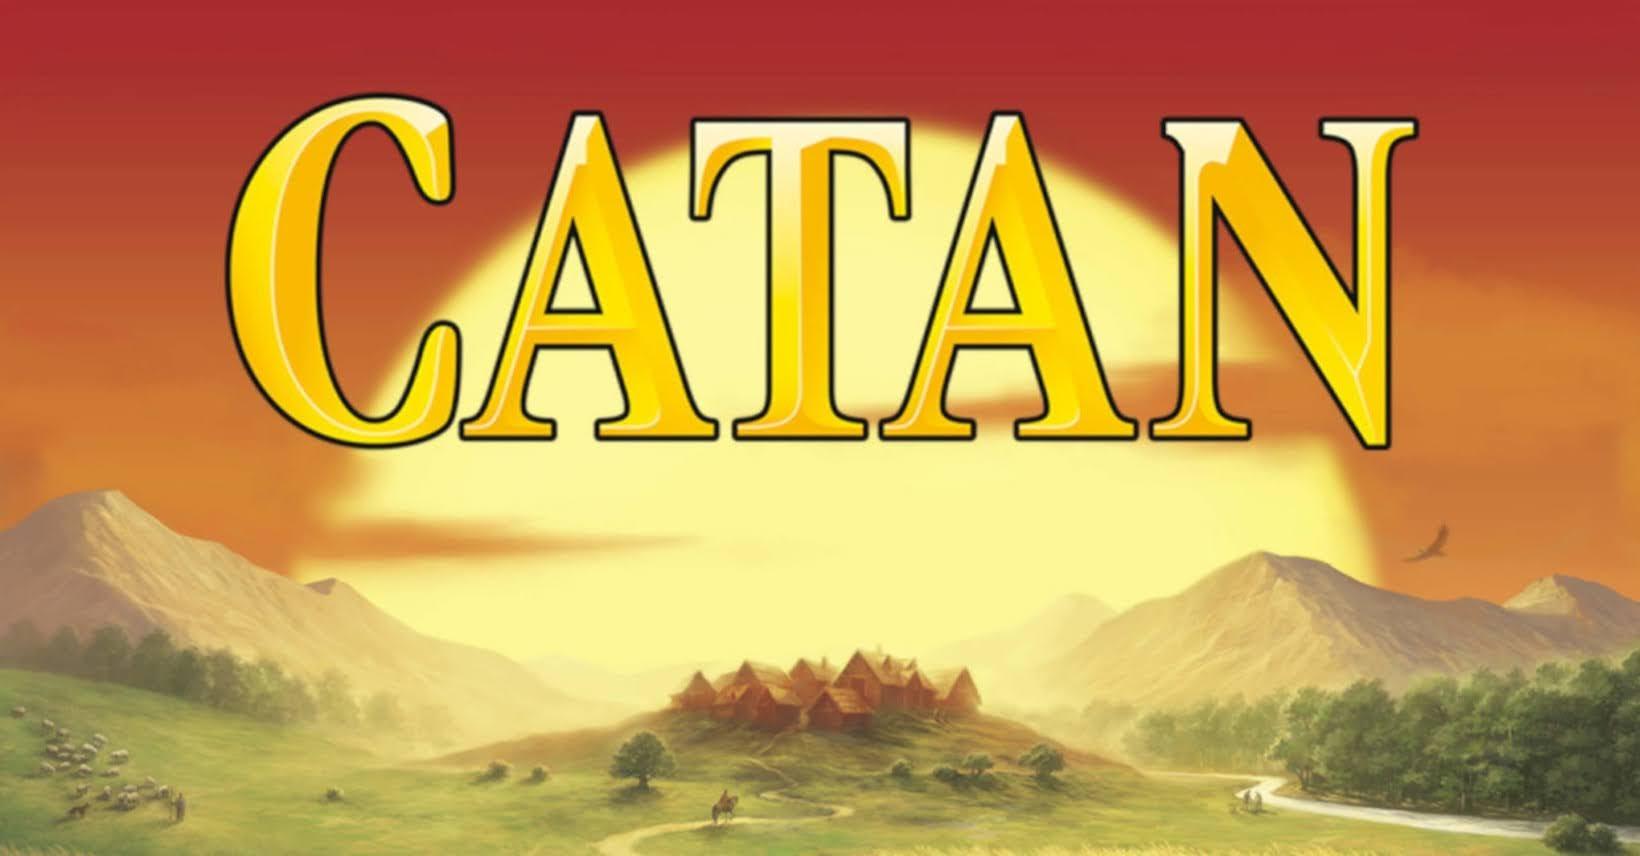 Održan 1. Hrvatski online Catan turnir